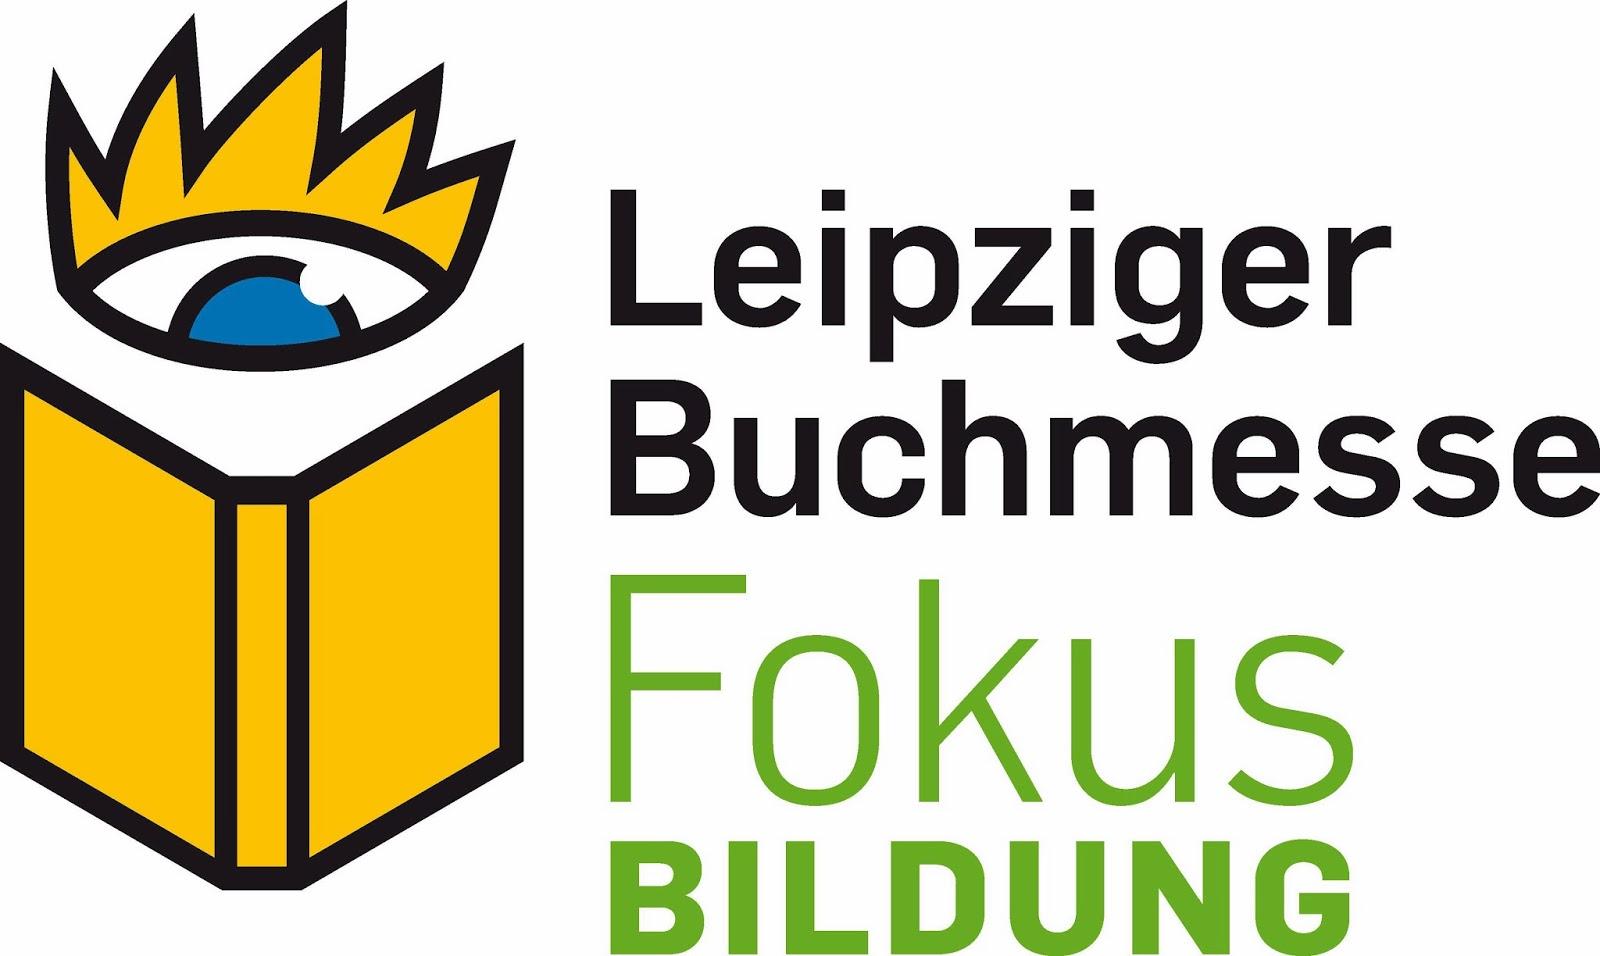 http://www.fokus-bildung-leipzig.de/